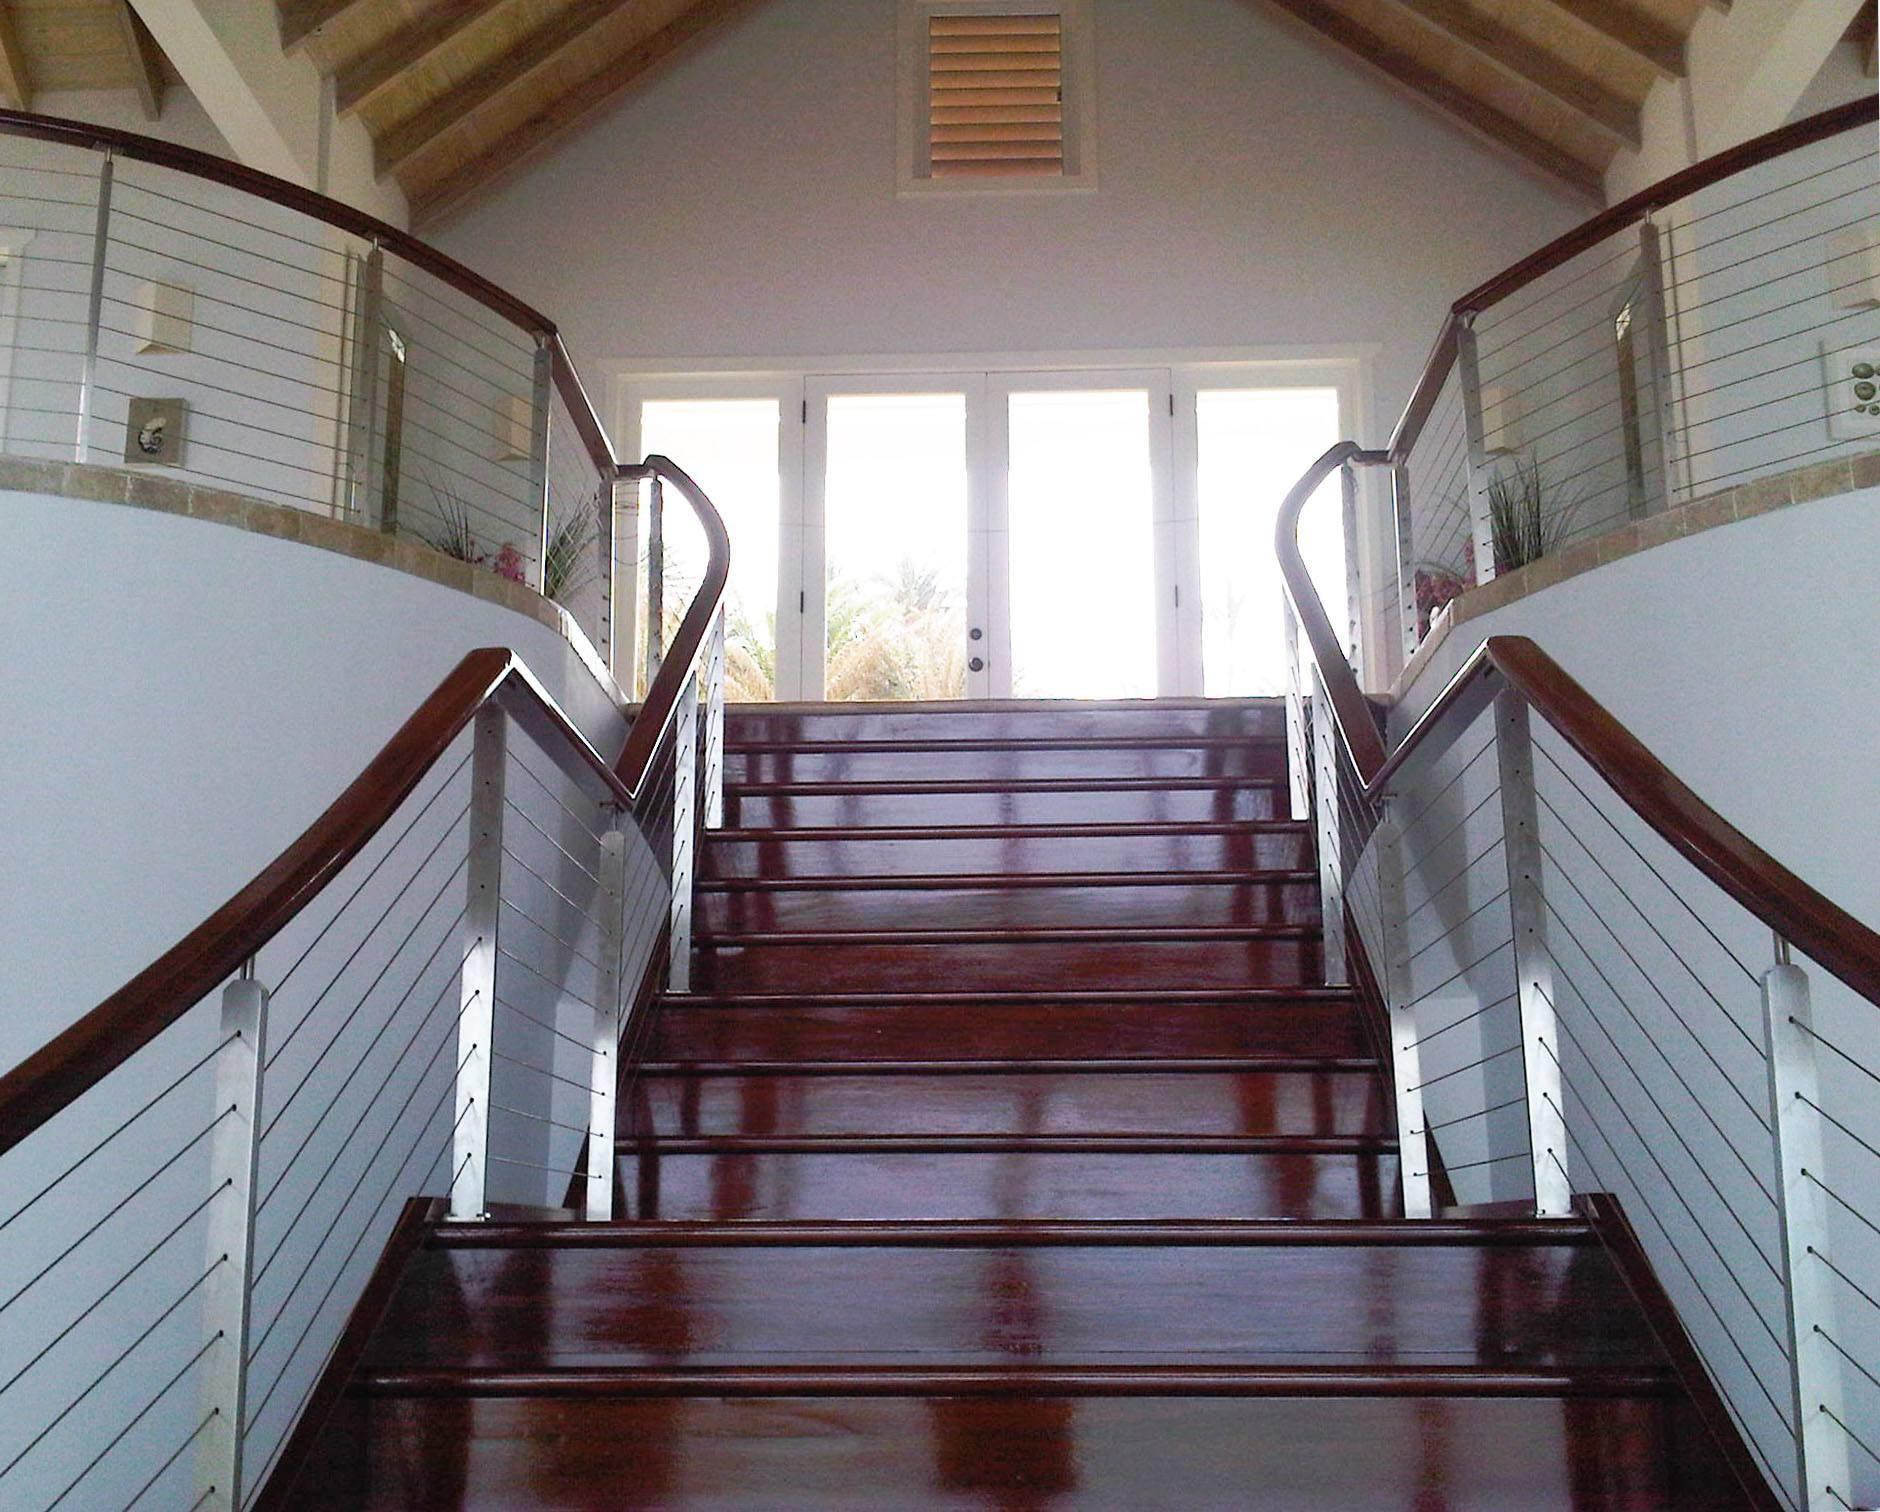 Stainless Steel Stair Railing Long Bay Antigua Keuka Studios   Ss Handrails For Stairs   Building   Glass   Horizontal   Flat Steel   Mild Steel Handrail